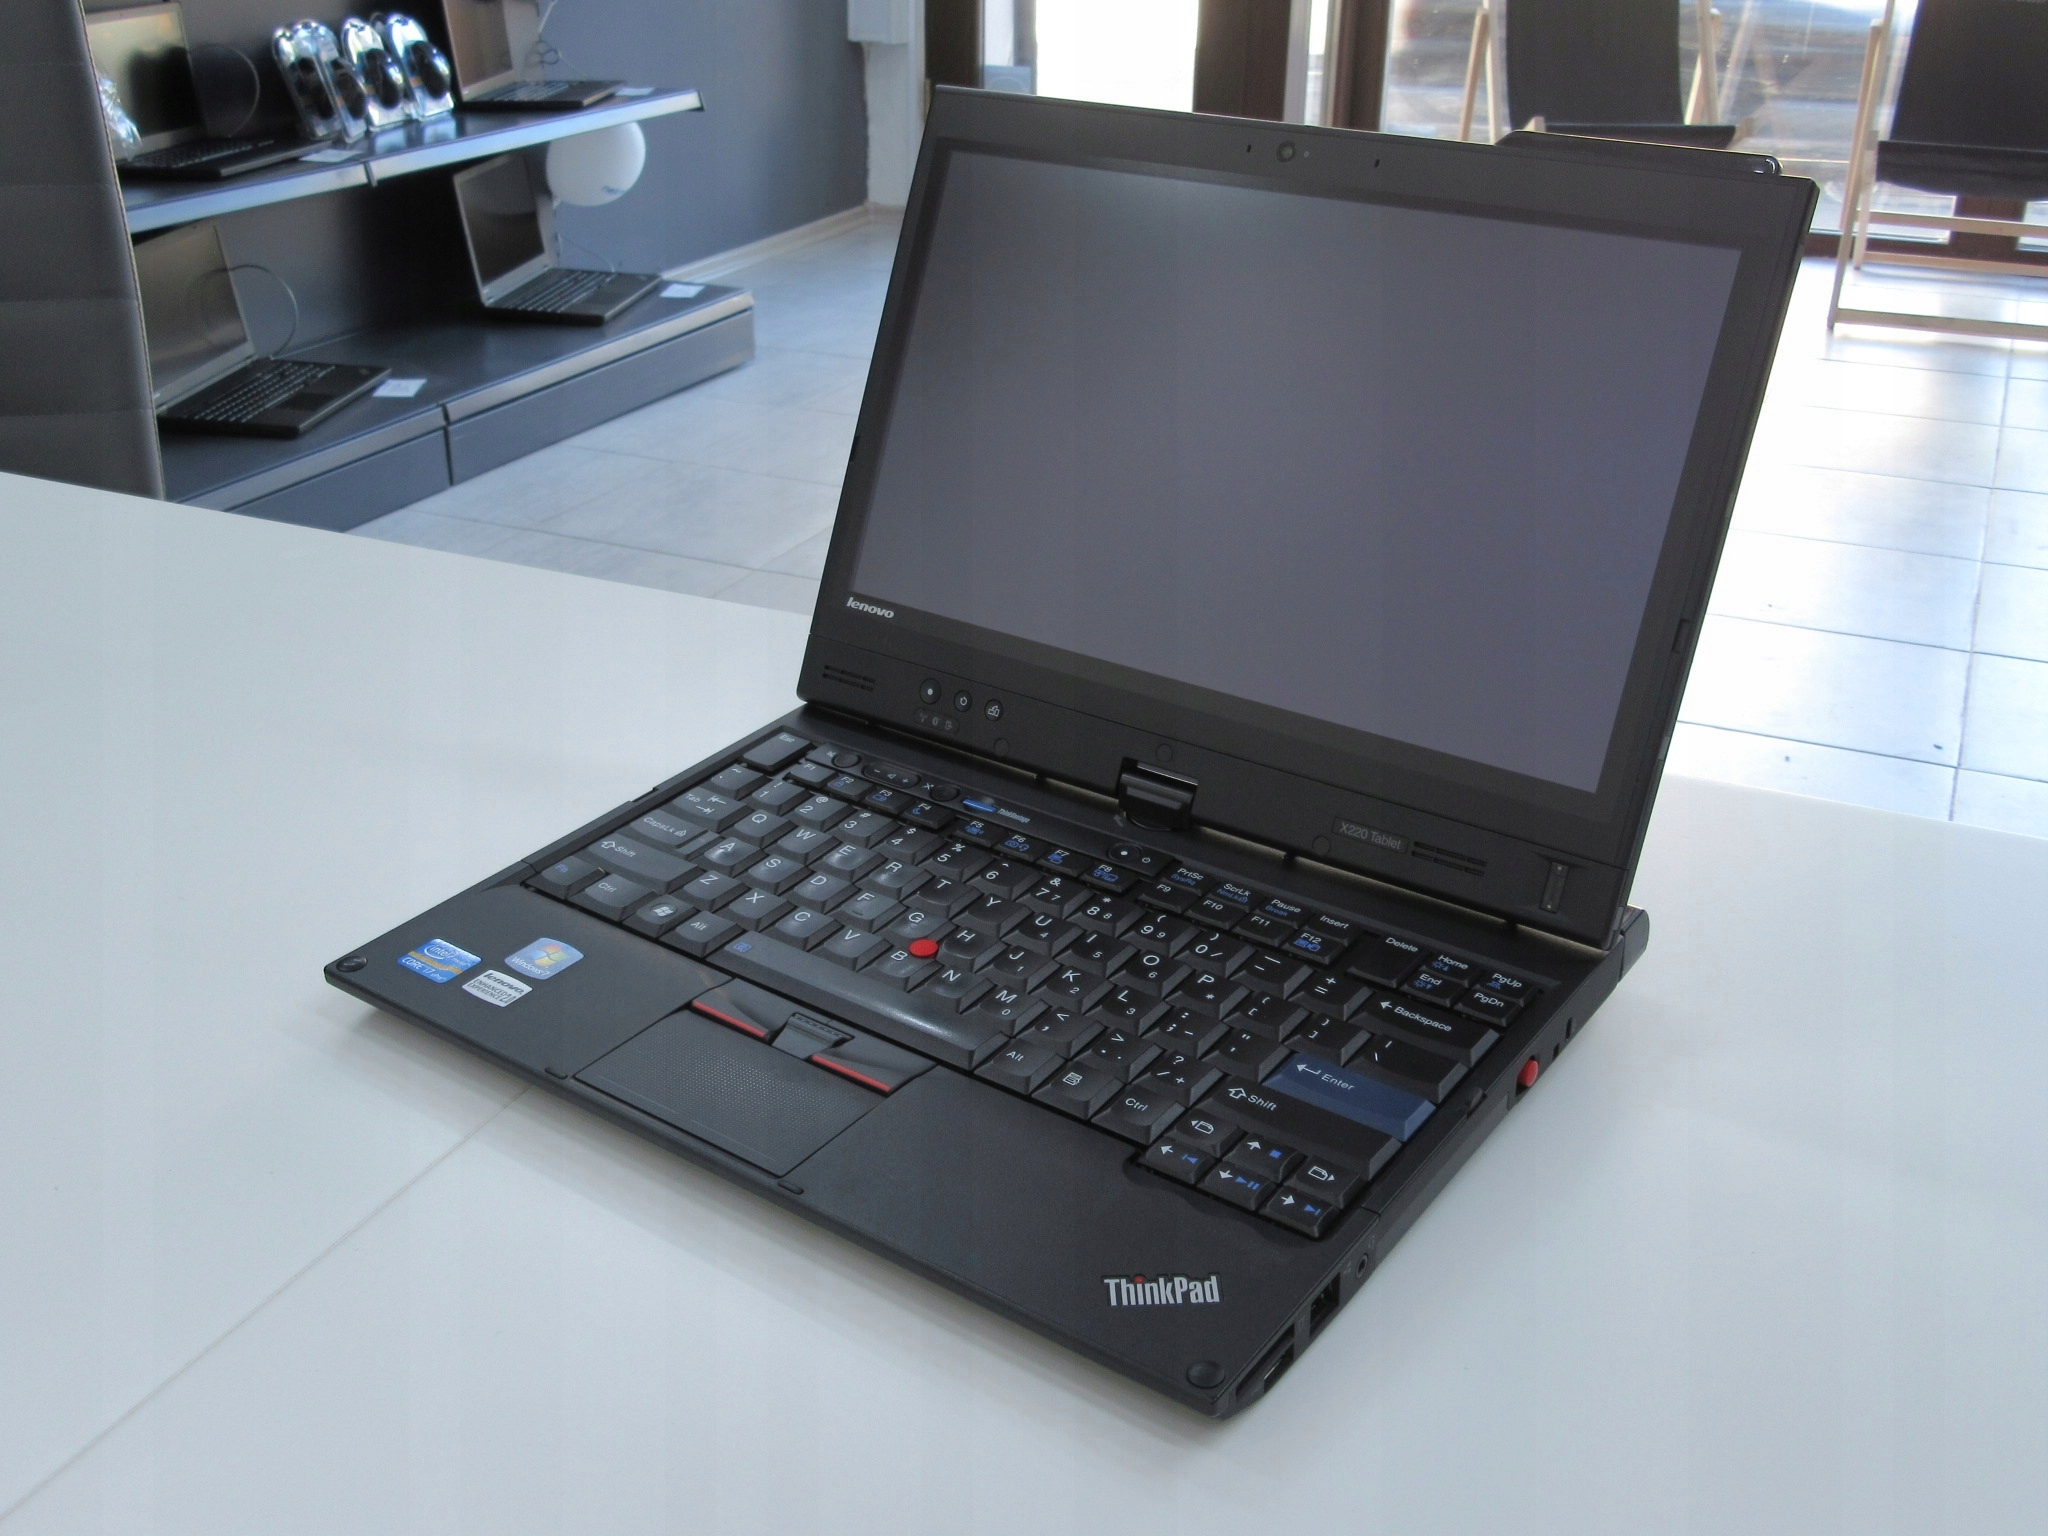 Lenovo X220 Tablet i7-2640M 128SSD 8GB IPS KlasaA